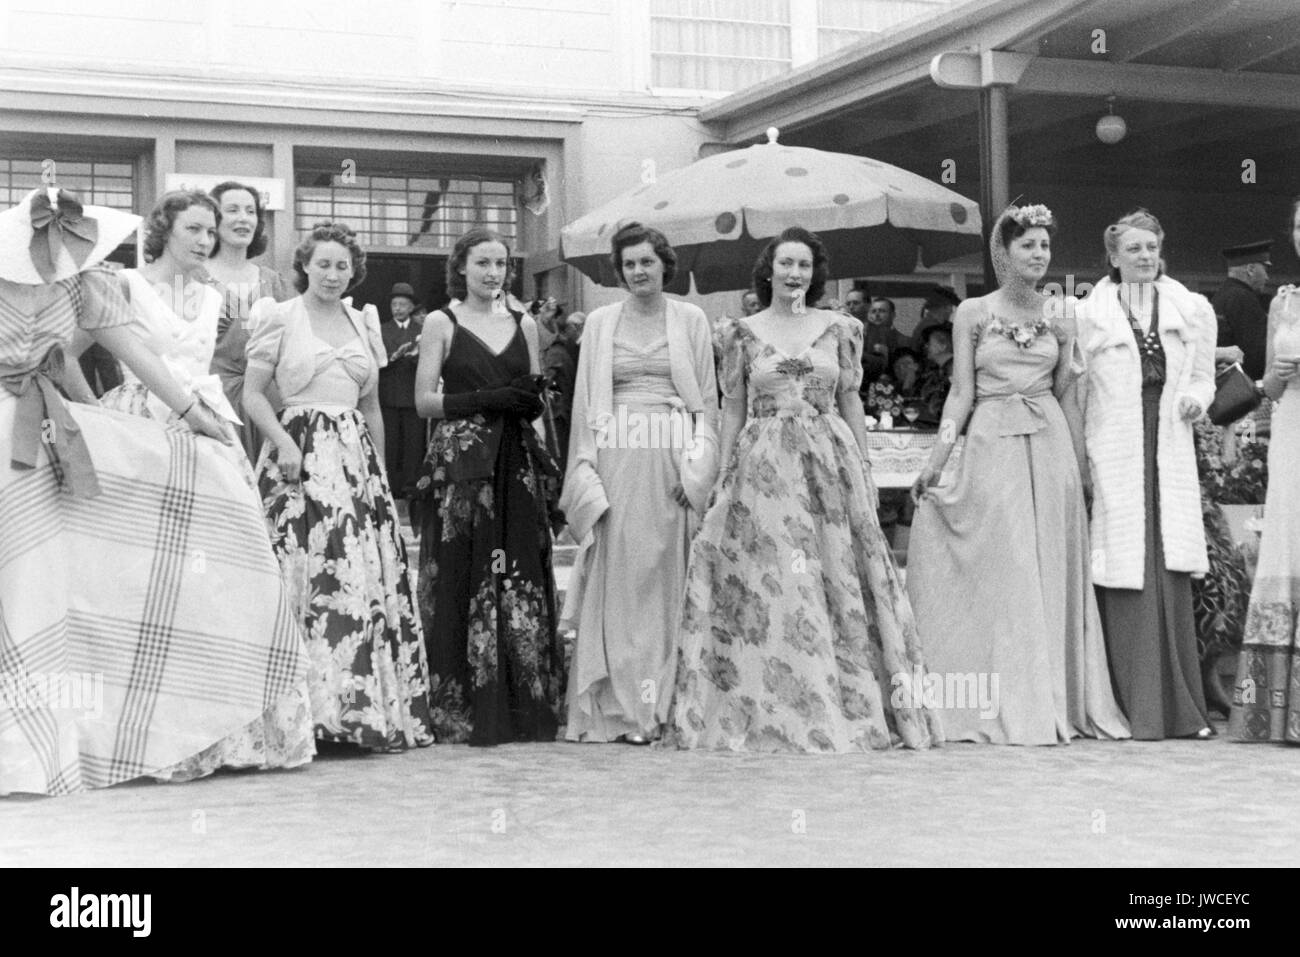 Models in elegant evening dresses at fashion show. - Stock Image